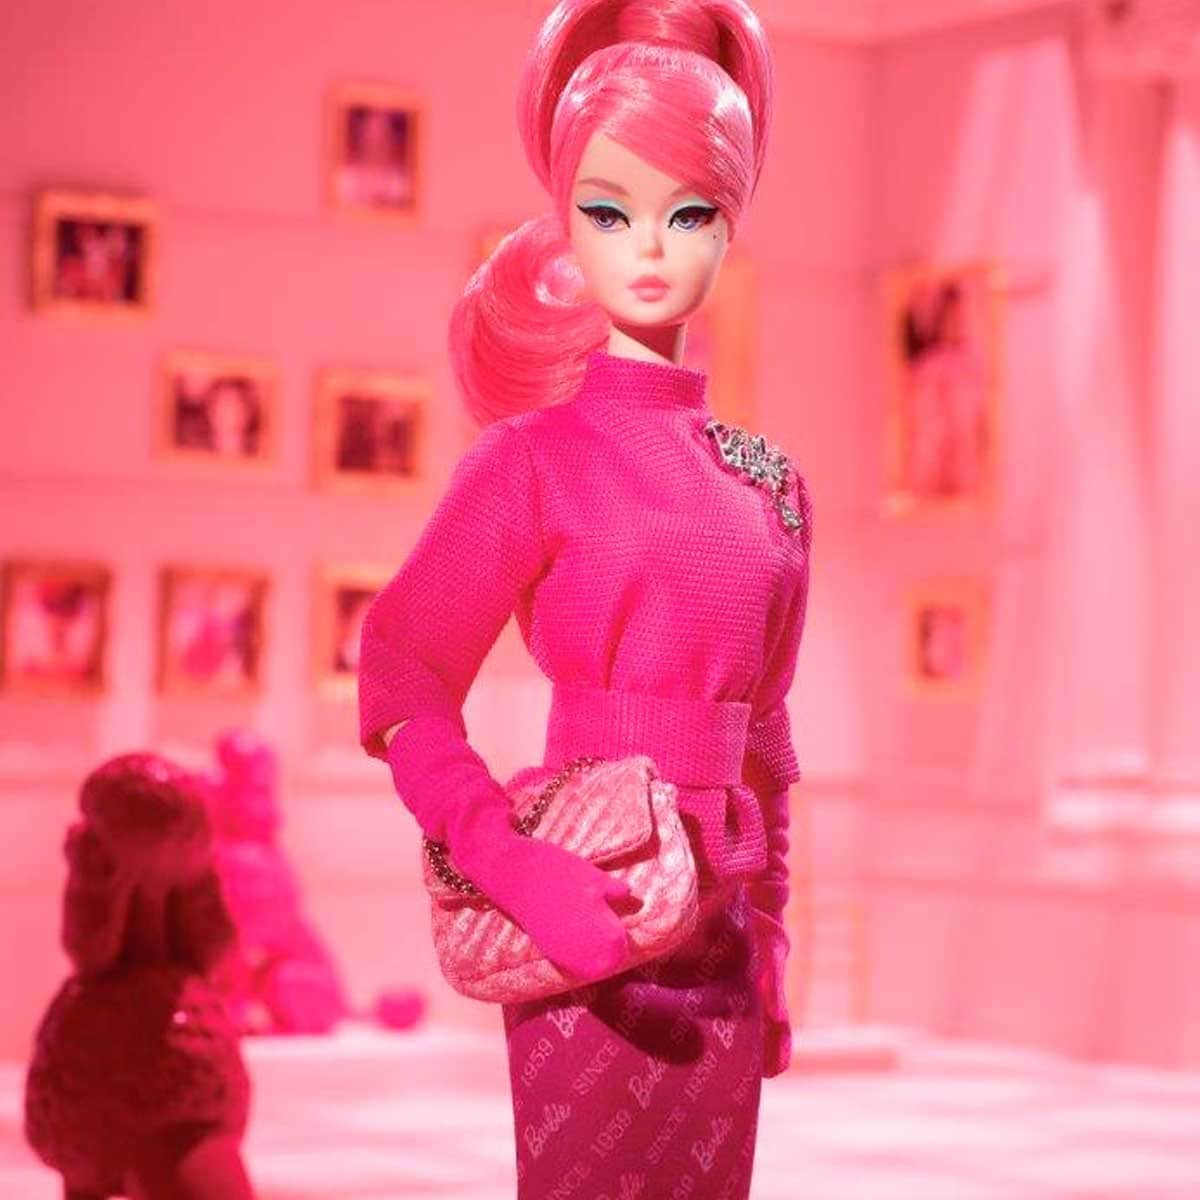 Barbie Bfmc Silkstone Pink (60Th) Barbie